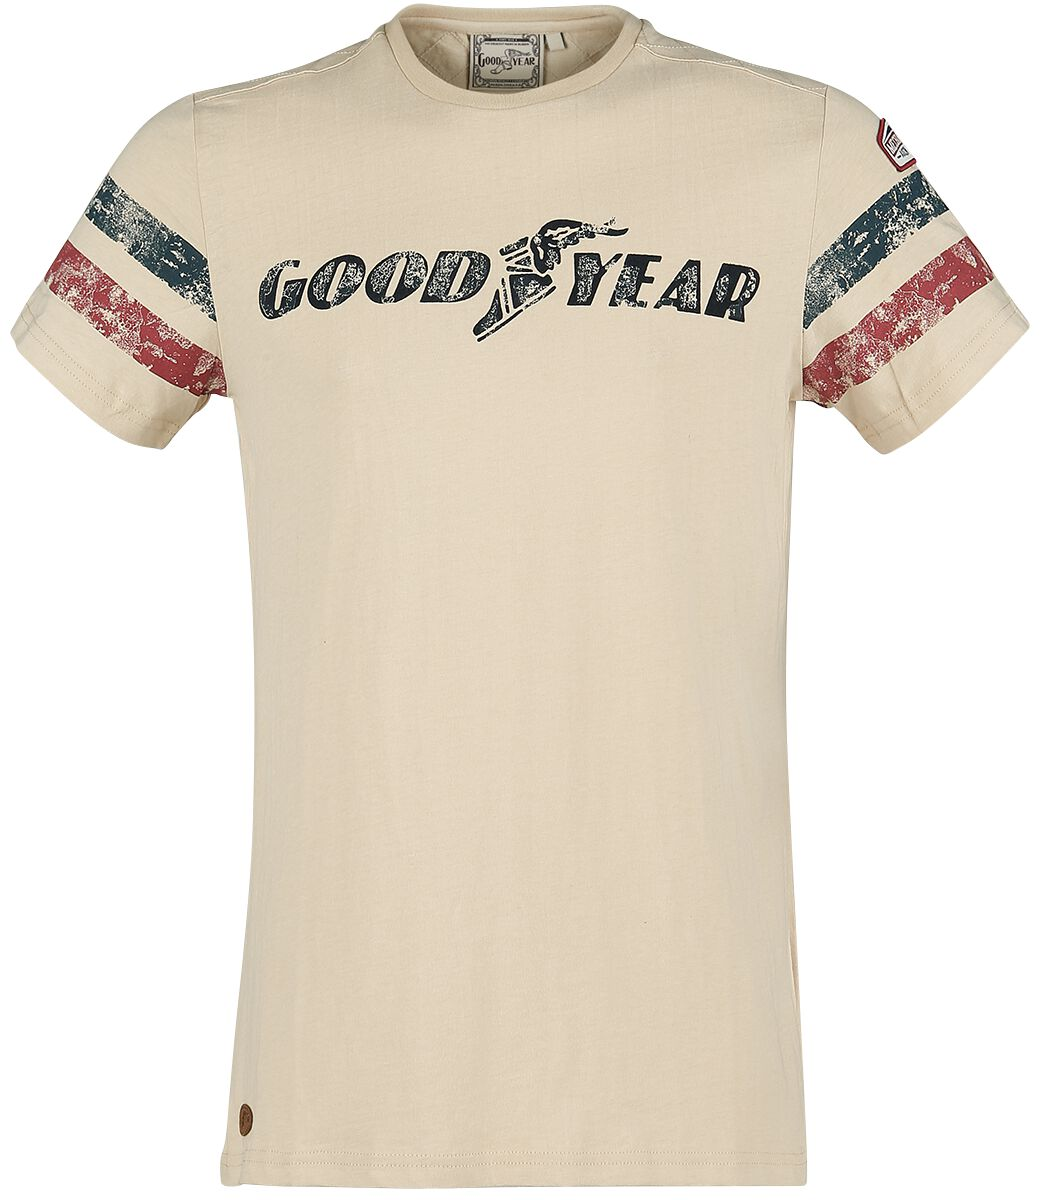 Image of GoodYear - Grand Bend - T-Shirt - Uomo - beige